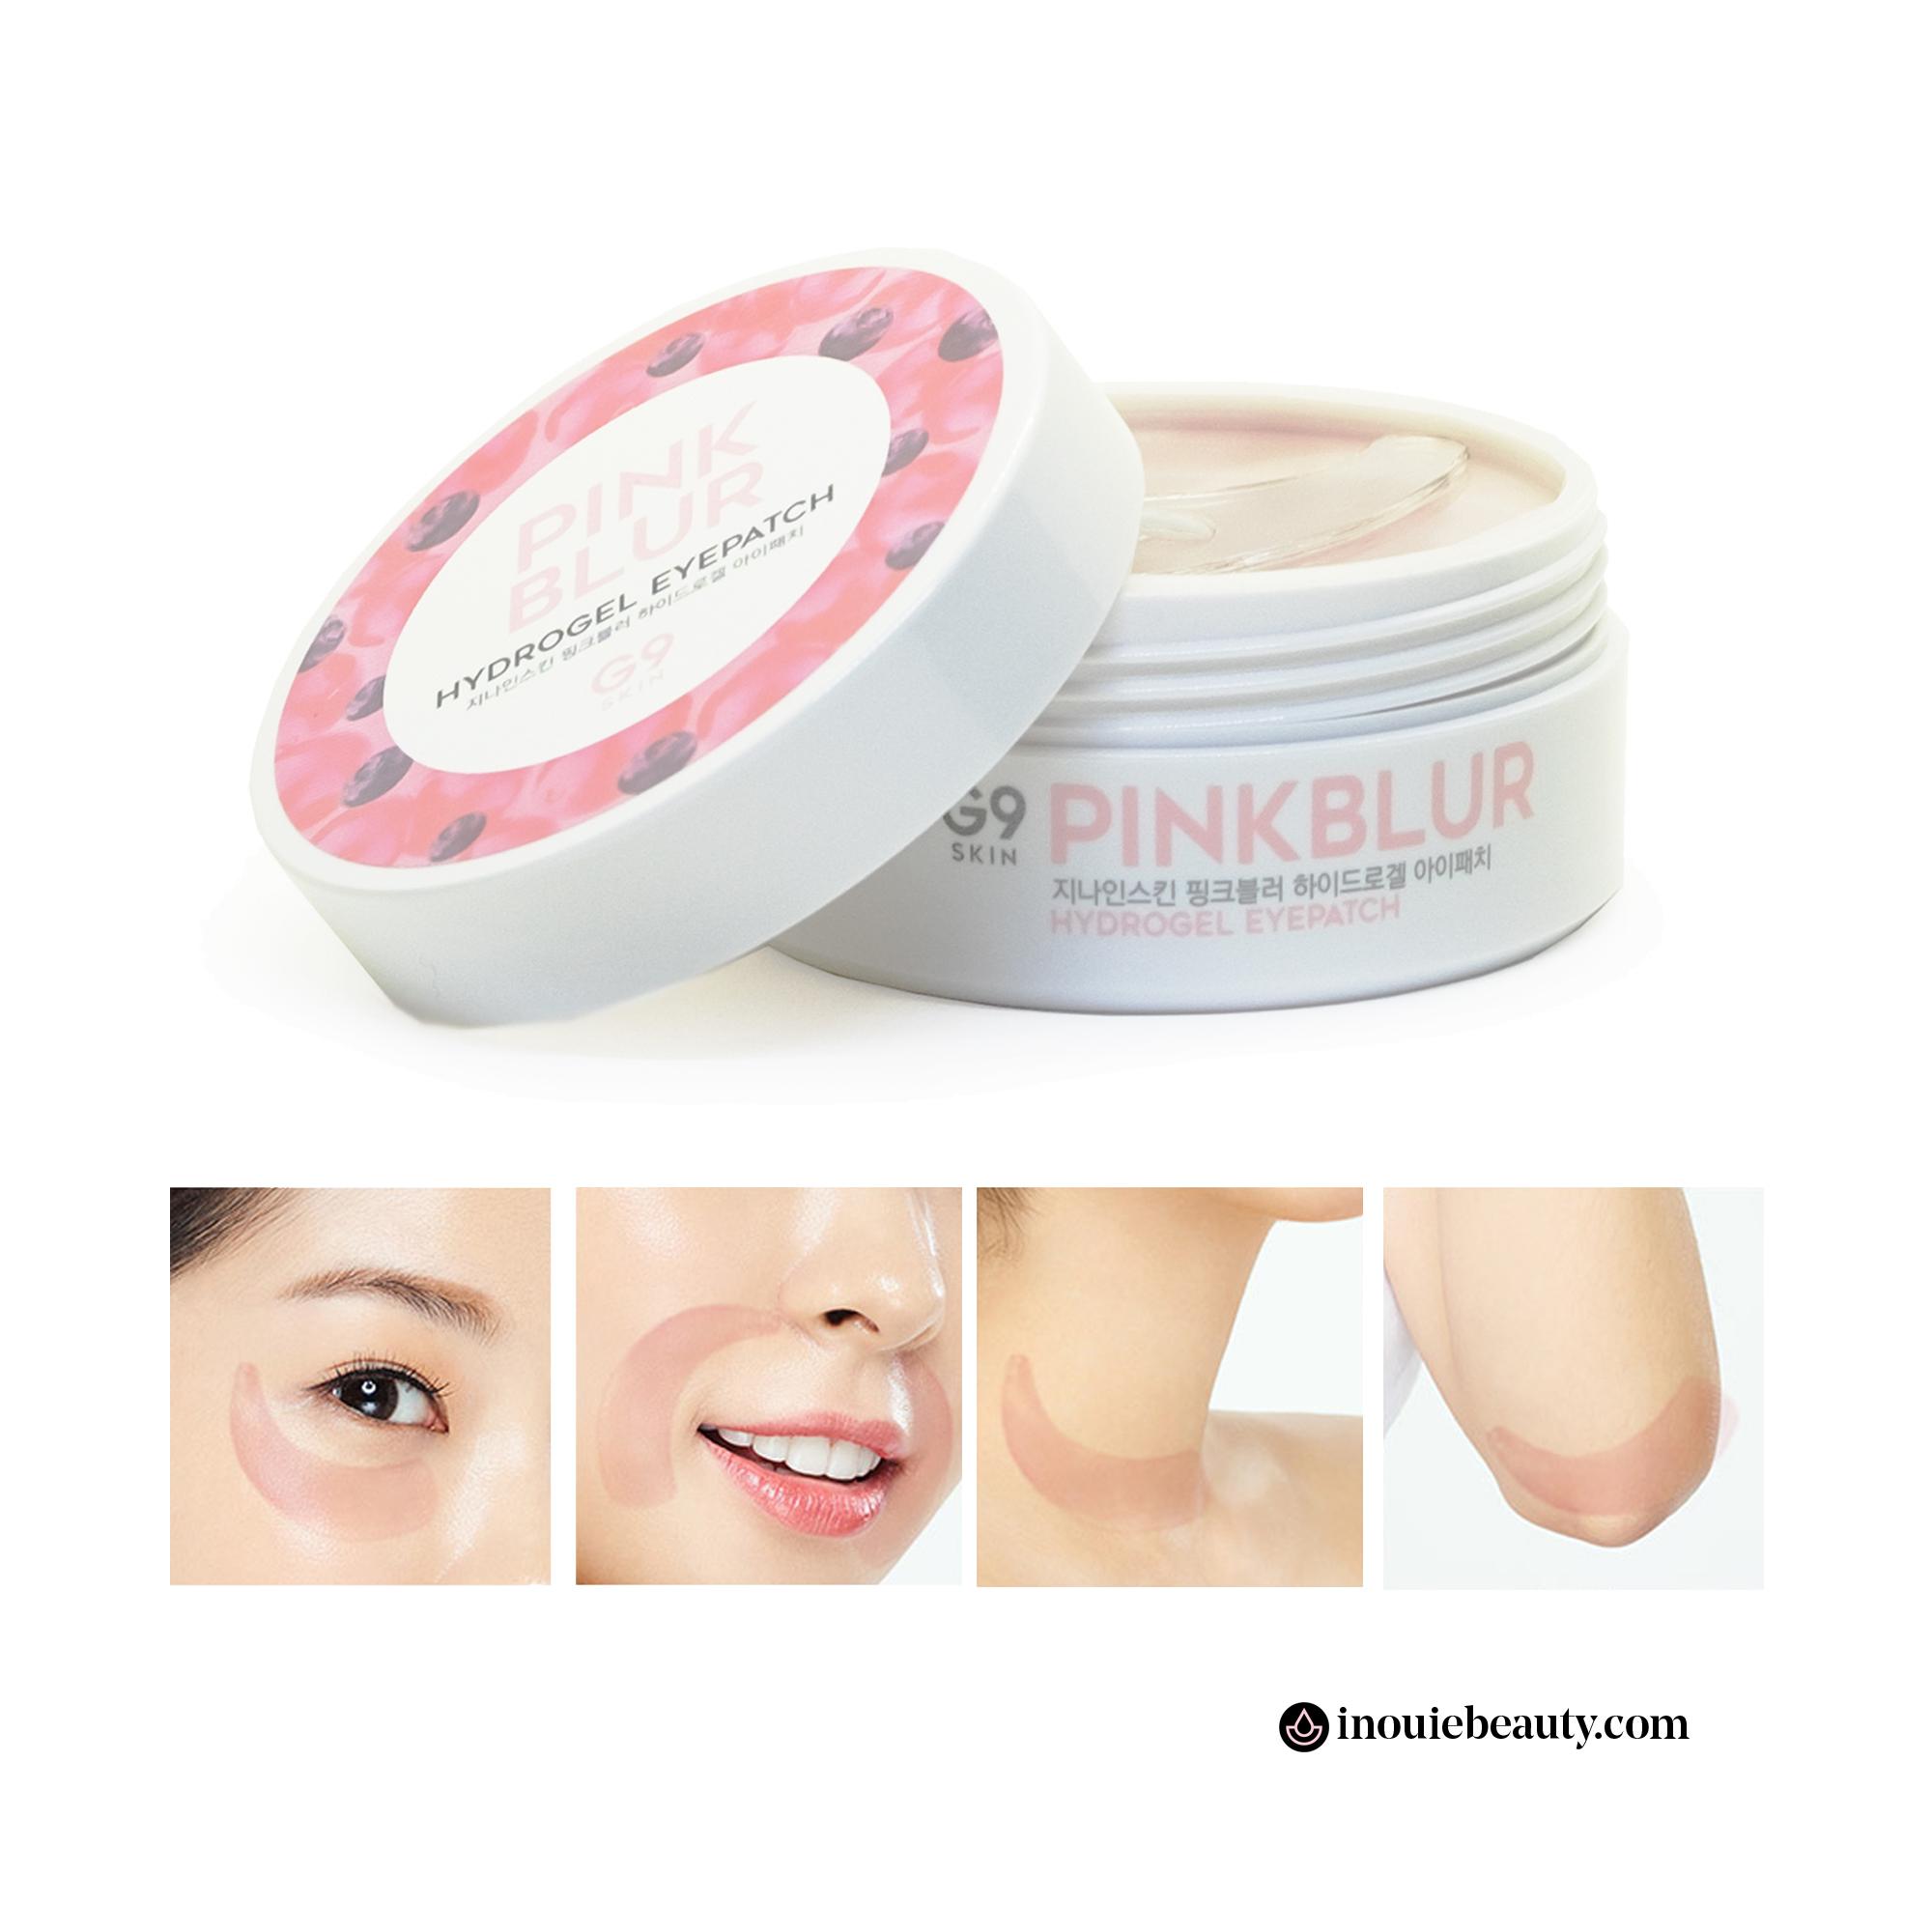 G9SKIN Pink Blur Hydrogel Eye Patches